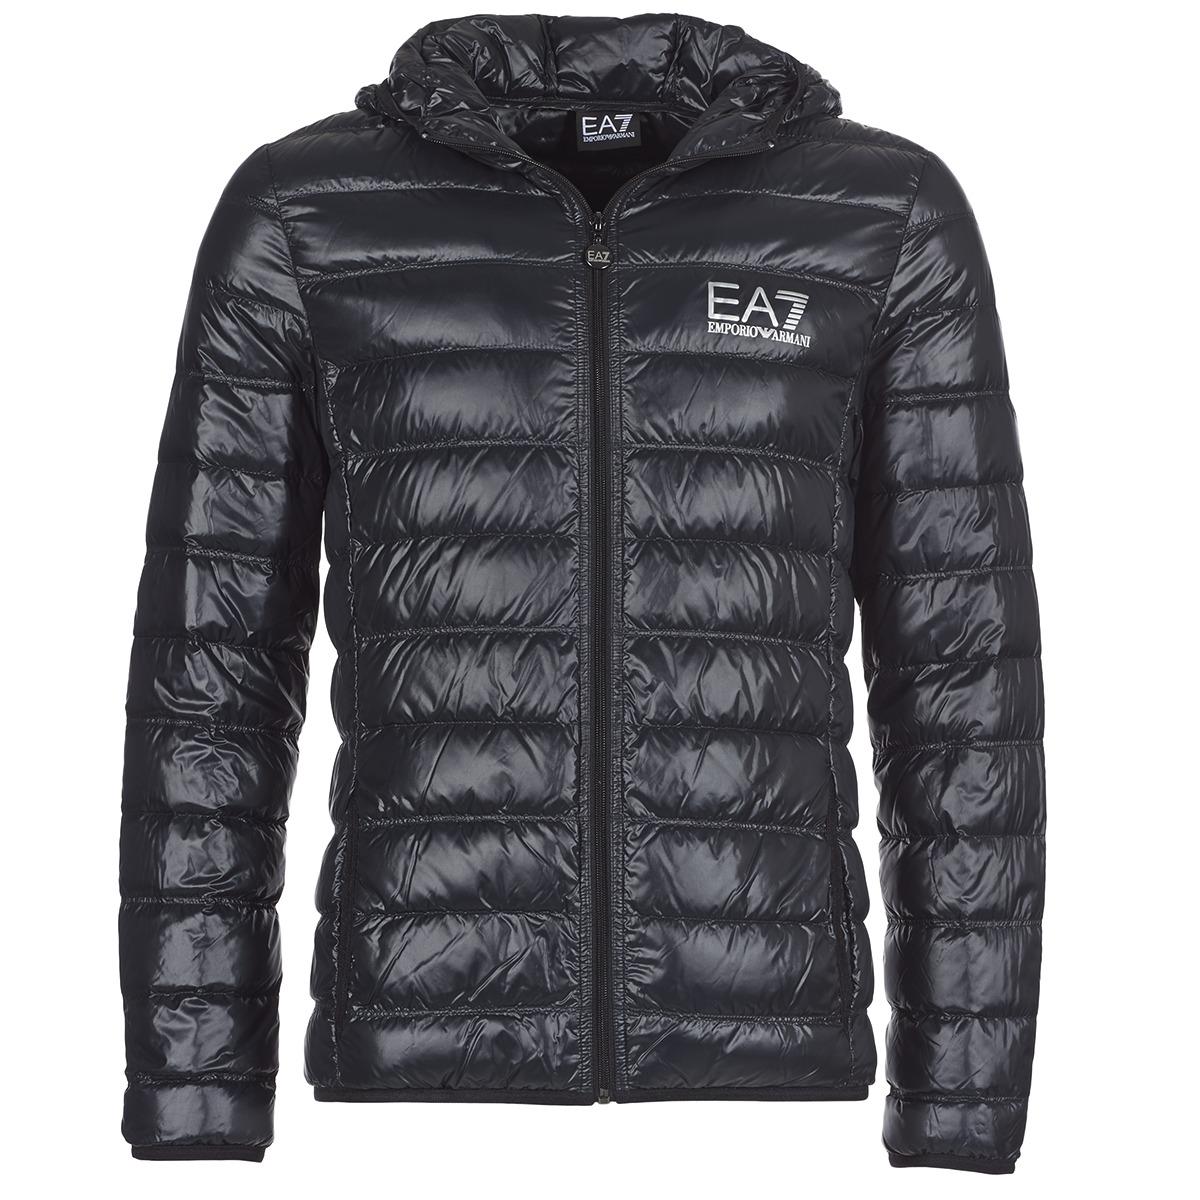 Emporio Armani EA7 ANDOURALO Svart - Fri frakt hos Spartoo.se ! - textil  Täckjackor Herr 1859 4c63bb14bff09